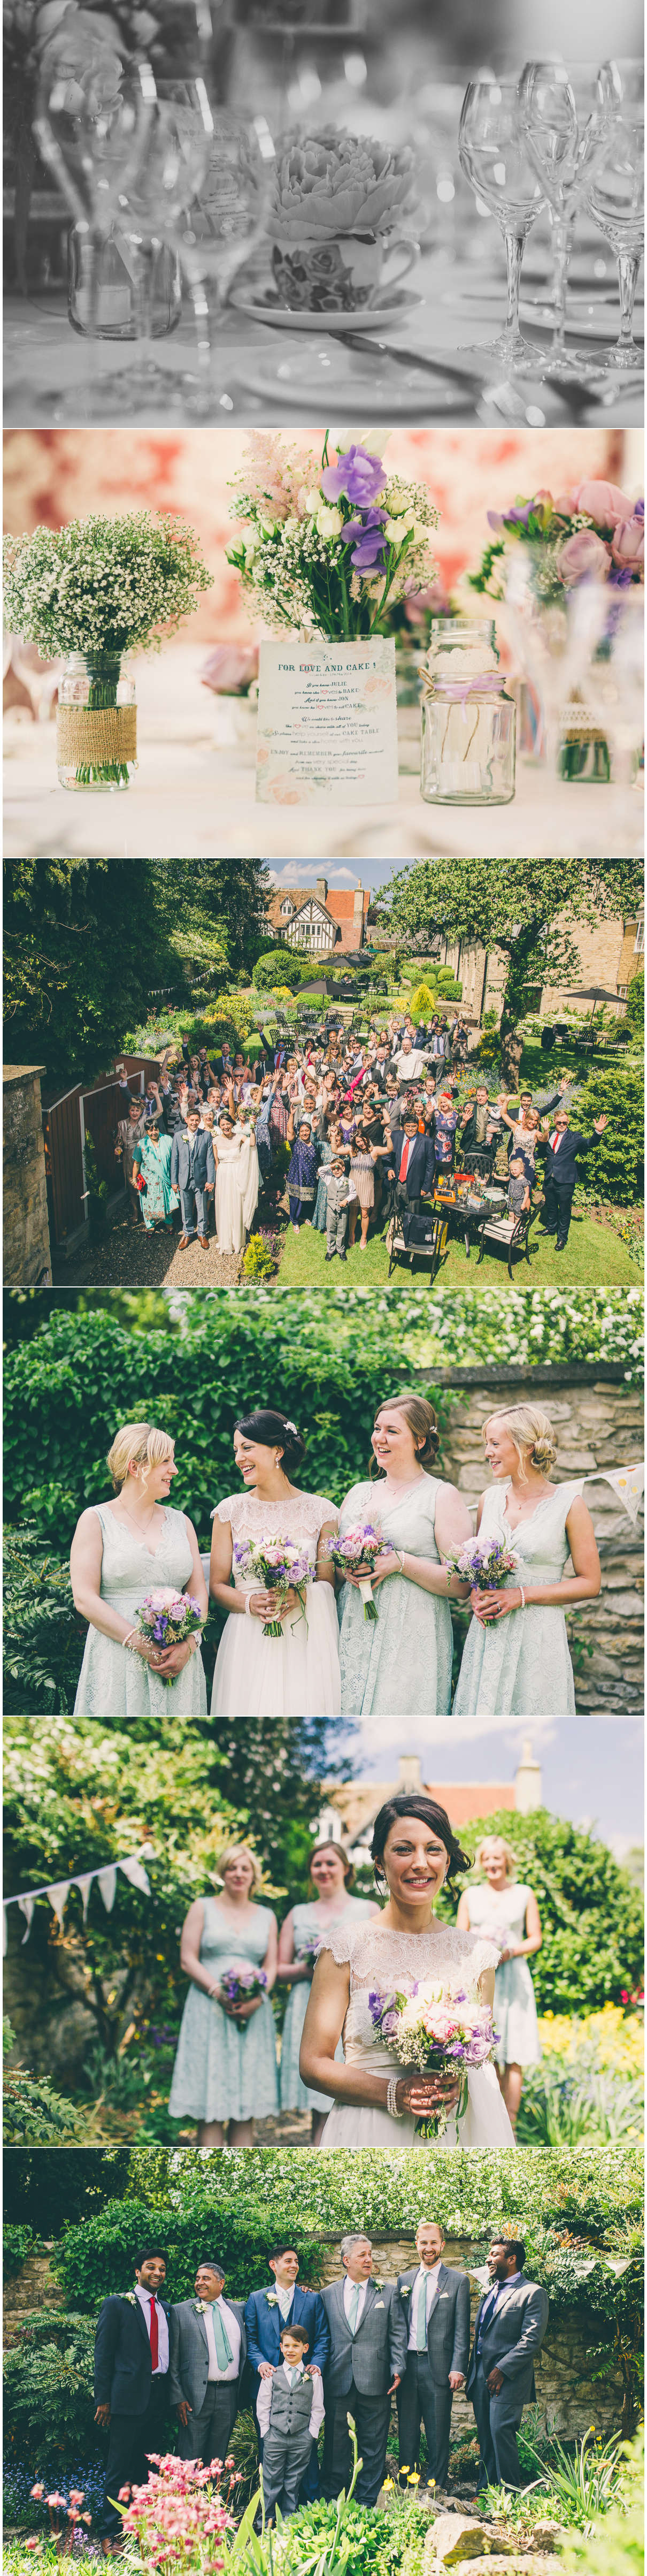 Neil_Jackson_Photographic_Scarborough_York_Yorkshire_Wedding_Photographer_Julie_Jon_Black_Swan_Helmsley_Wedding_Shoot_Blog8